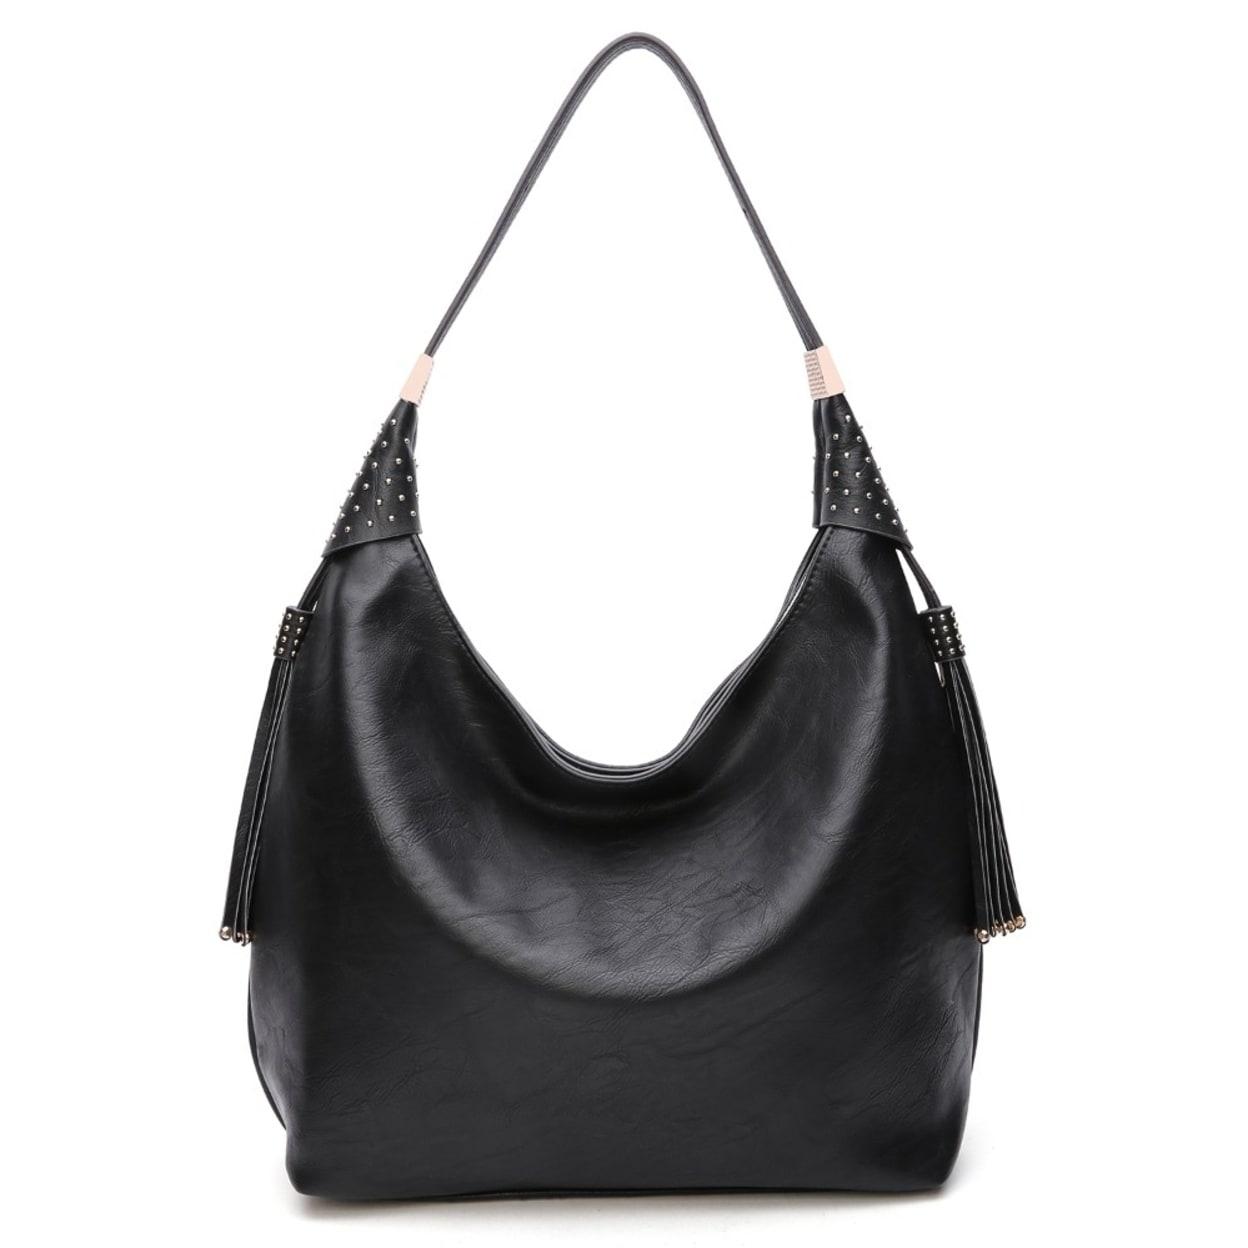 Shop MKF Collection Alya Vegan Leather Fashion Hobo Bag by Mia K ... 0066151ef1111